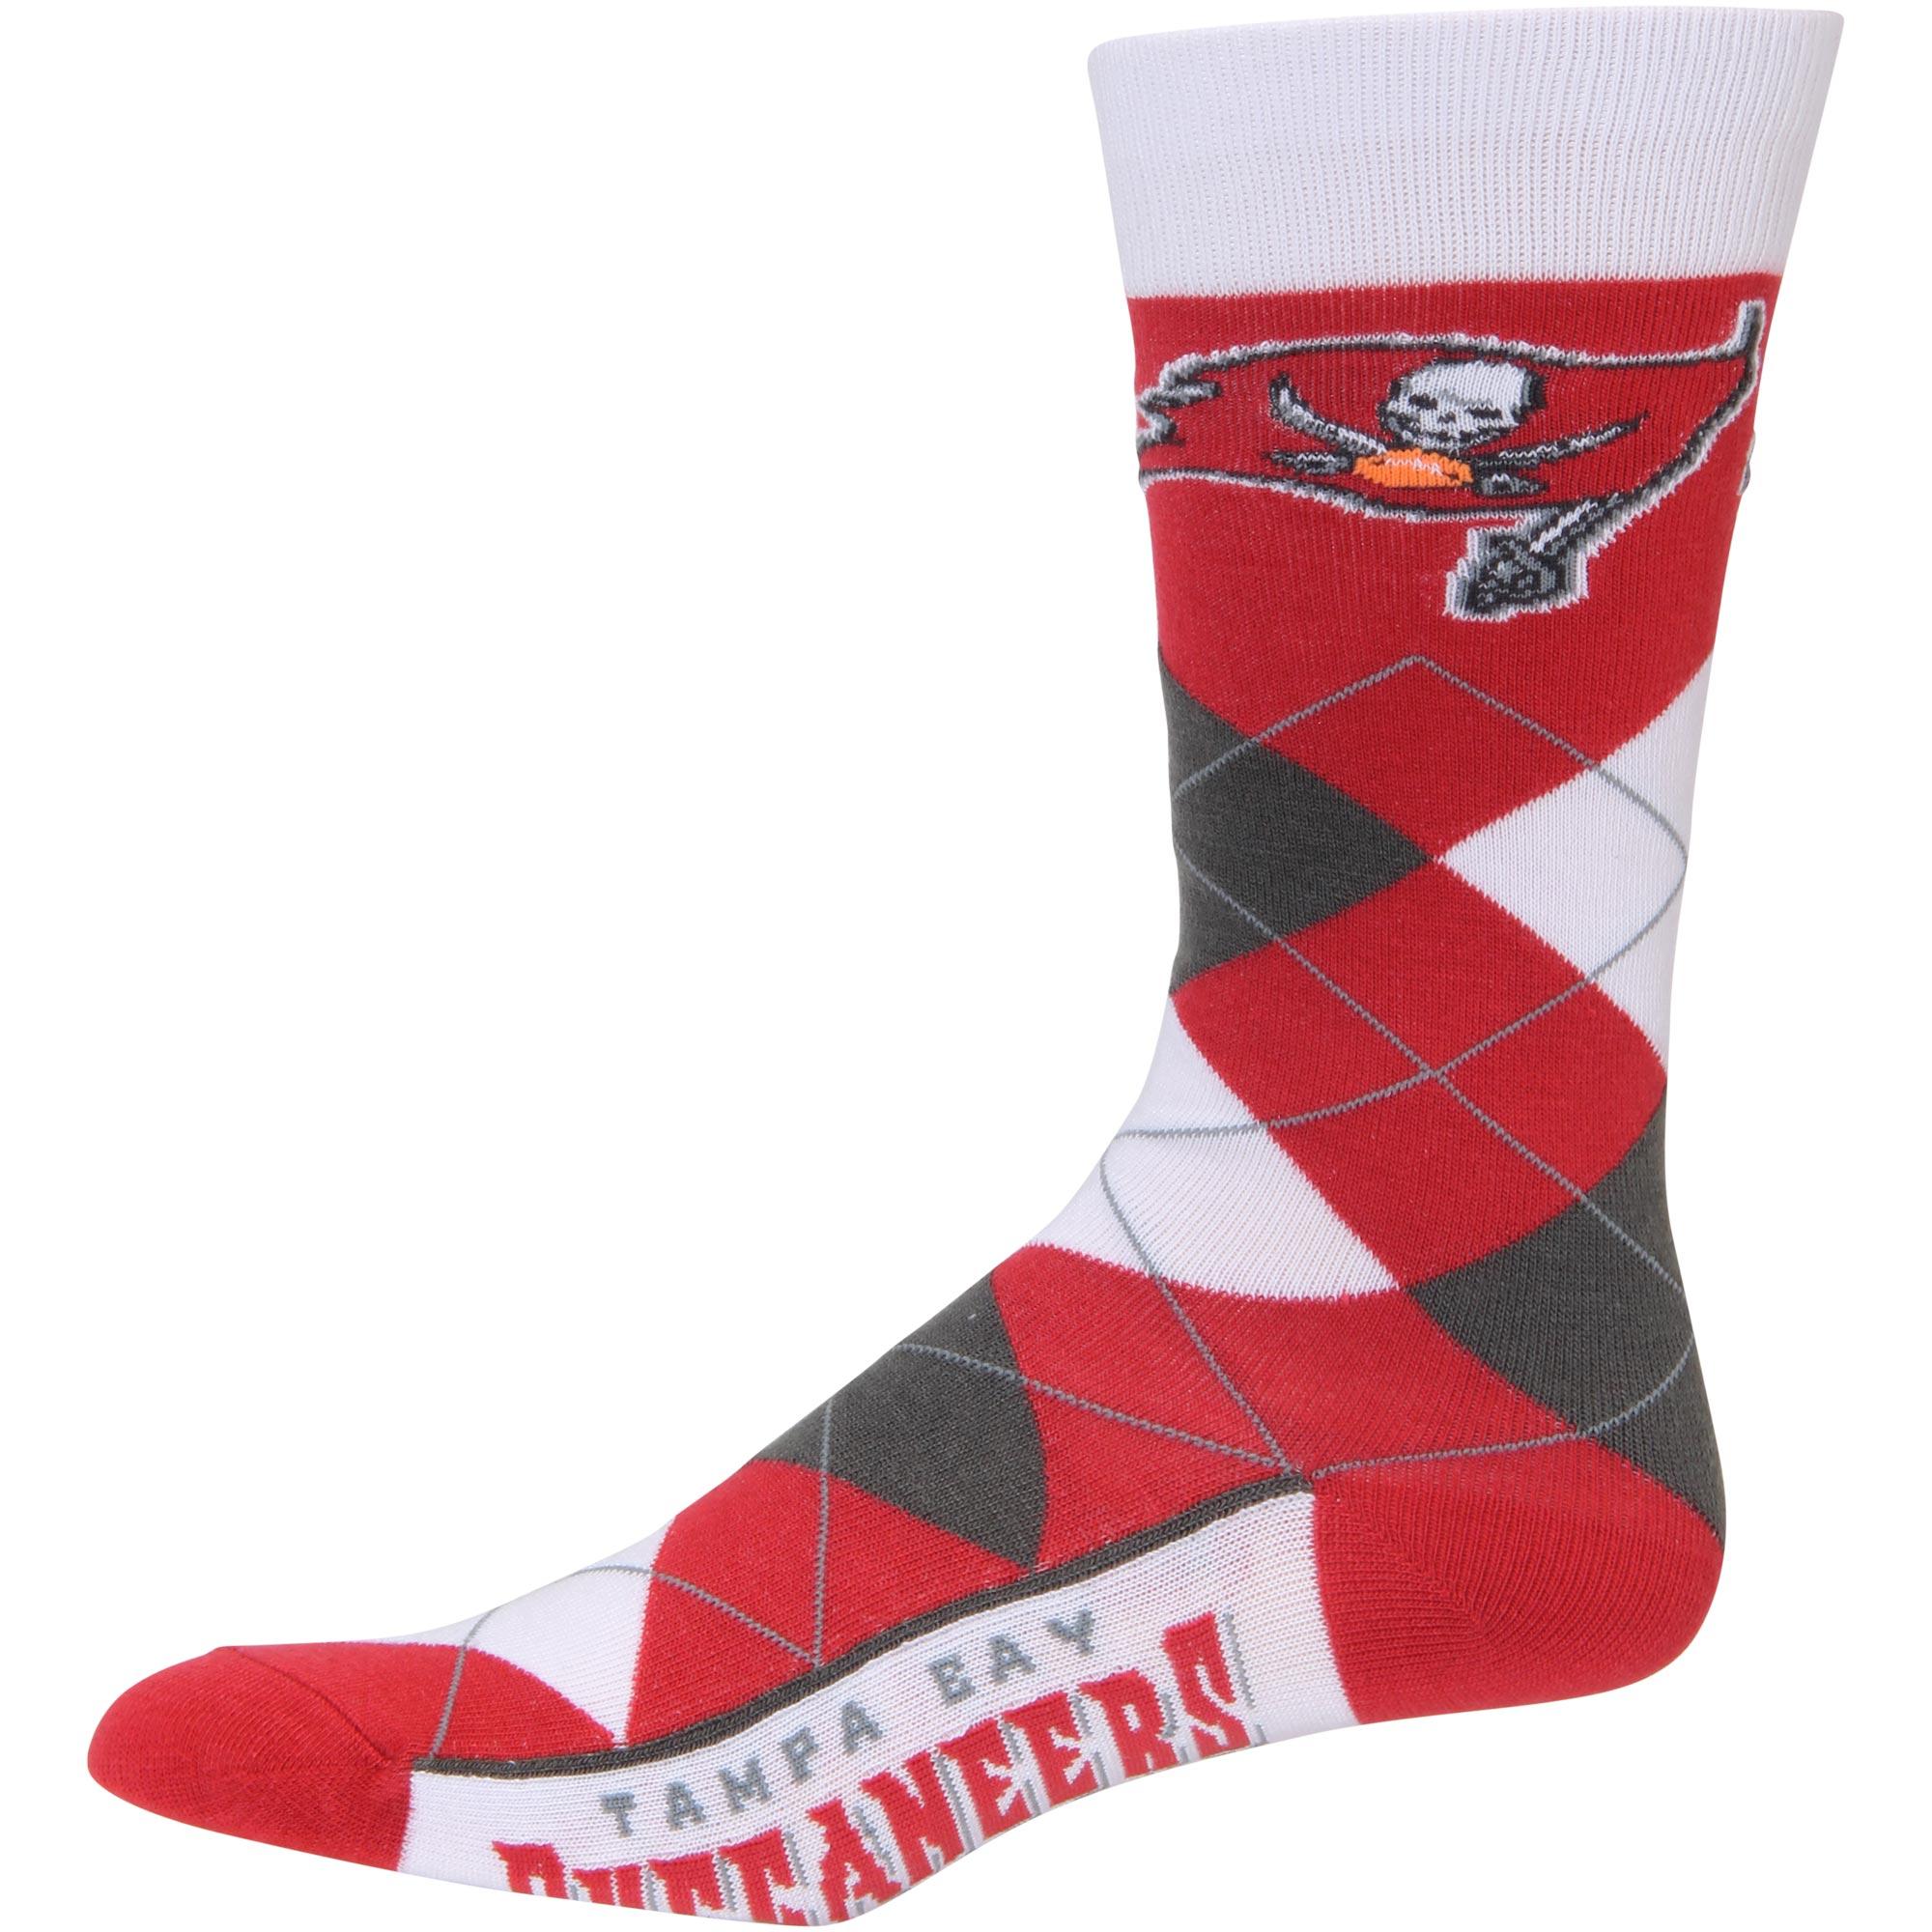 Tampa Bay Buccaneers For Bare Feet Argyle Crew Socks